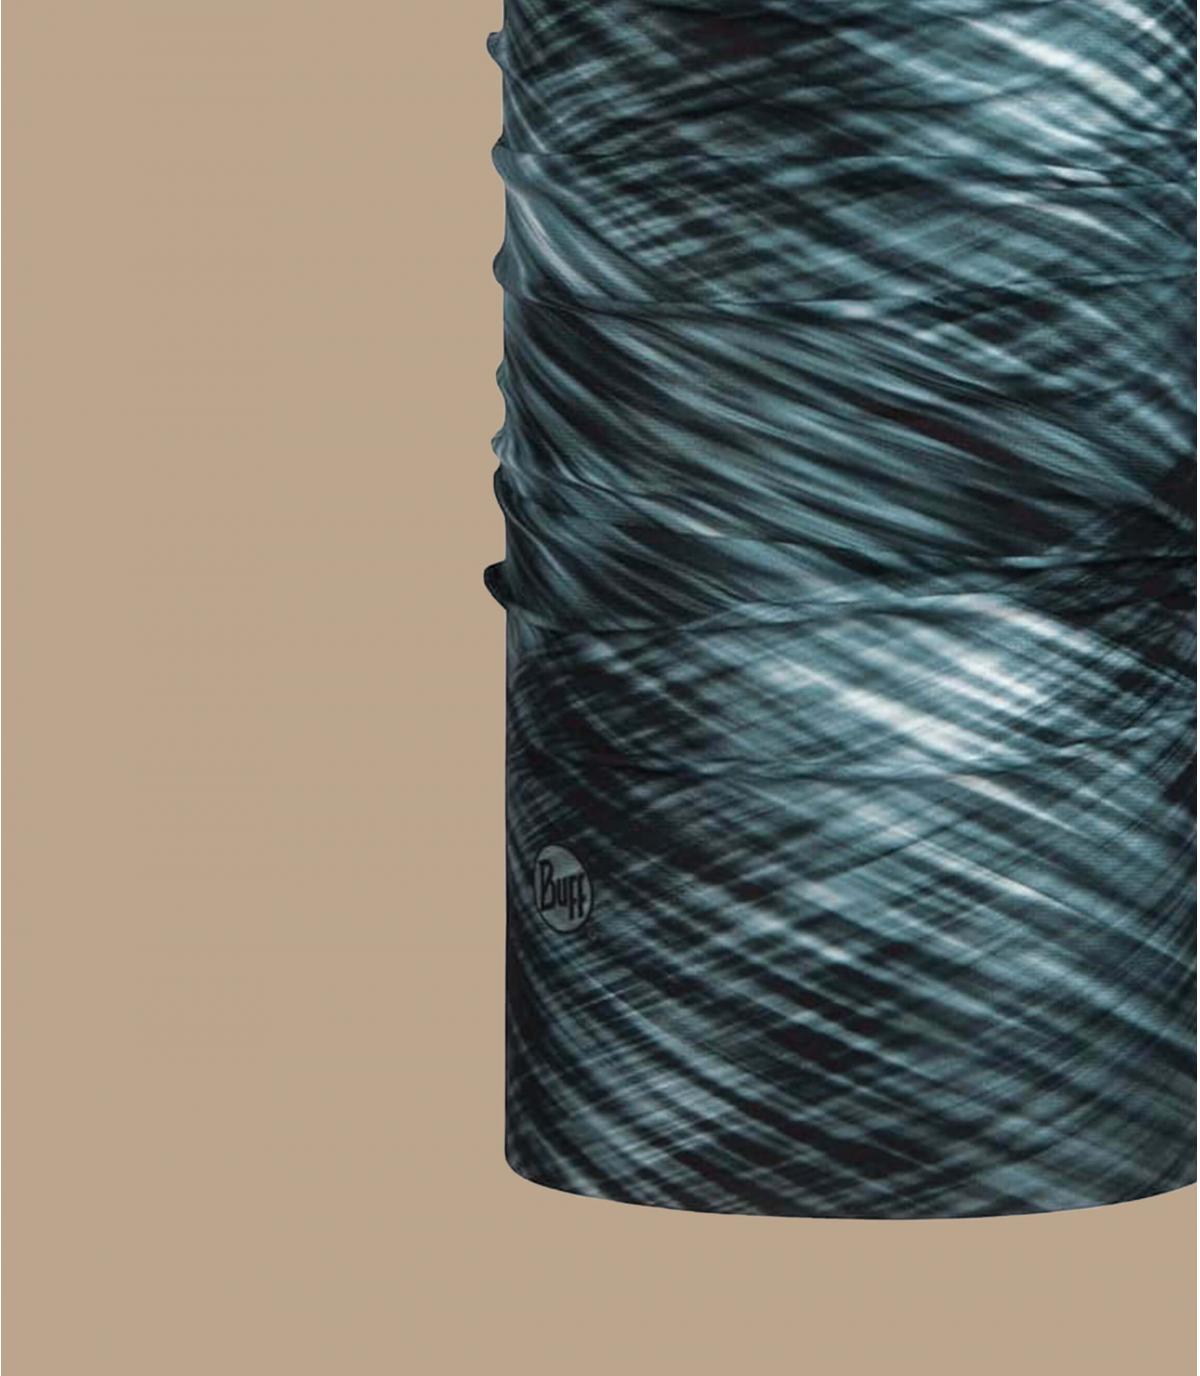 Détails Filter Tube shoren black - image 3